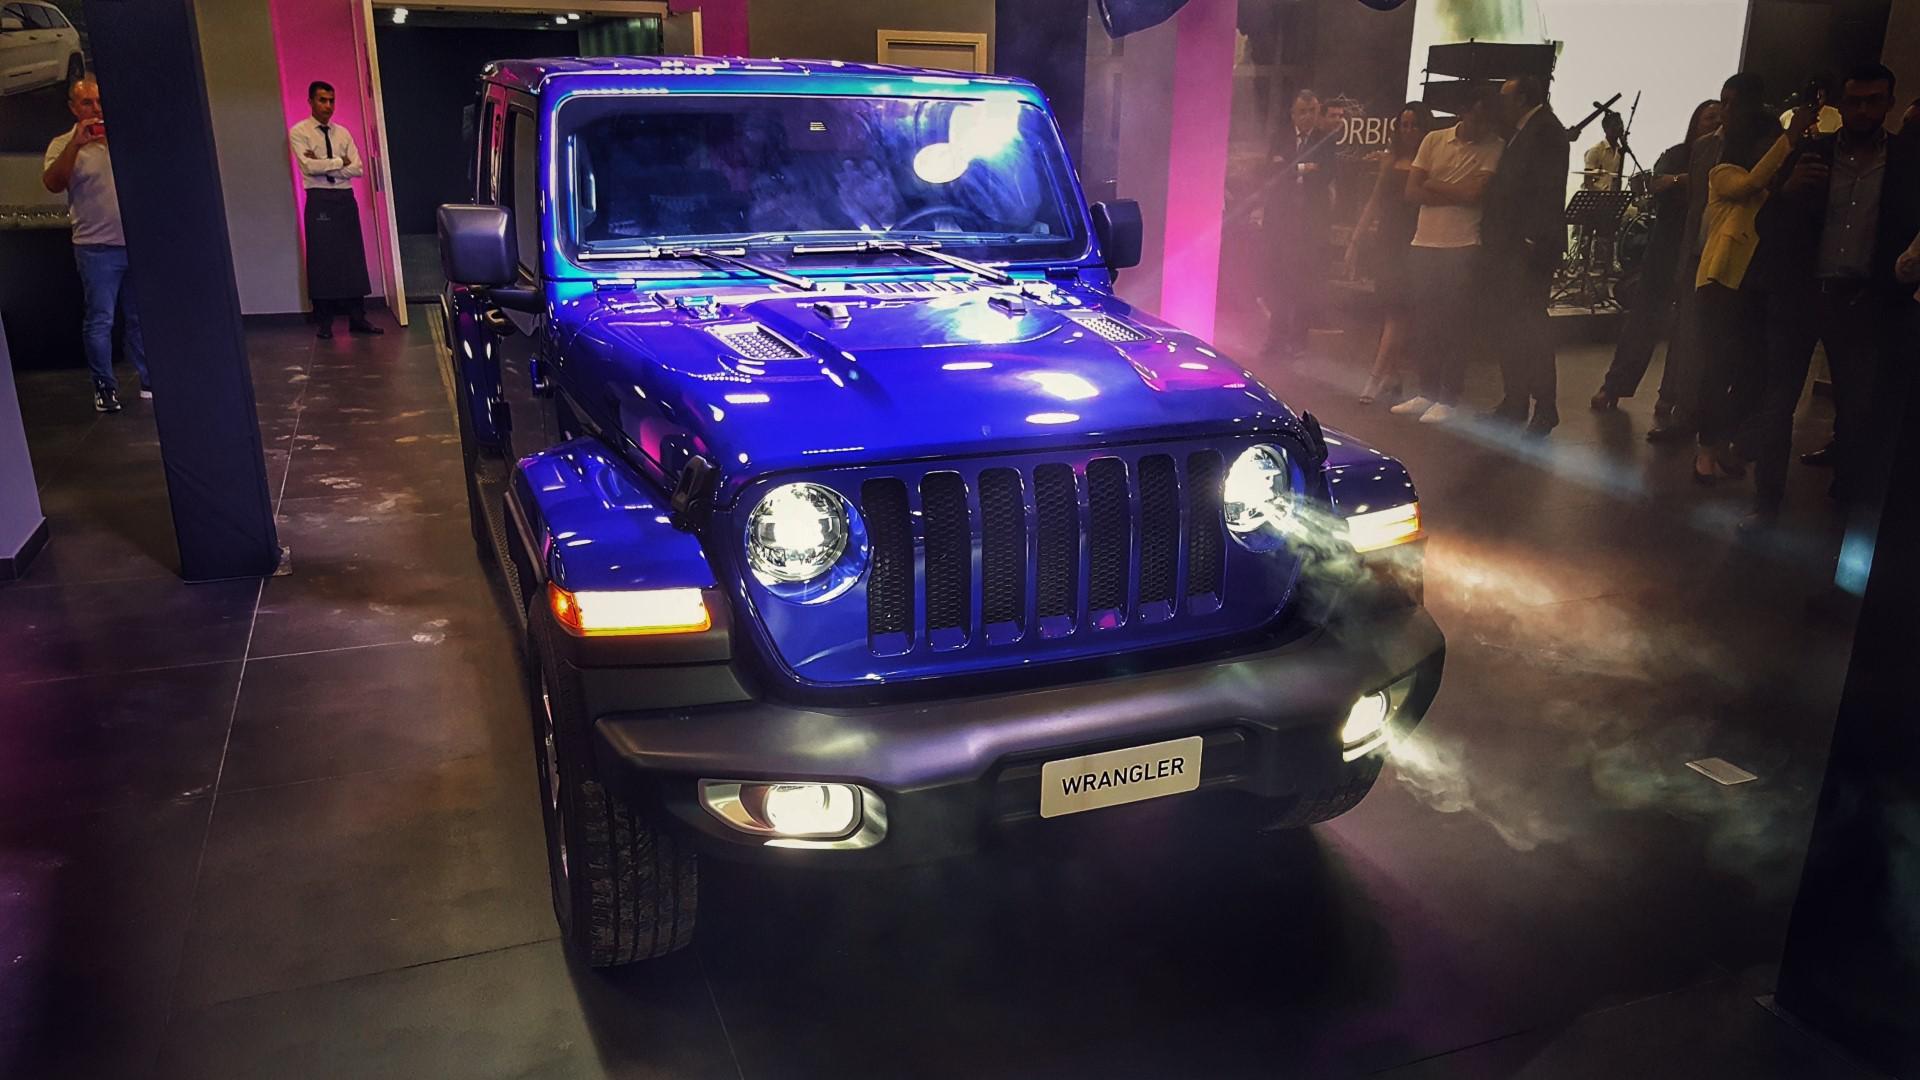 orbis-automotive-inaugure-son-nouveau-showroom-a-rabat-1119-9.jpg